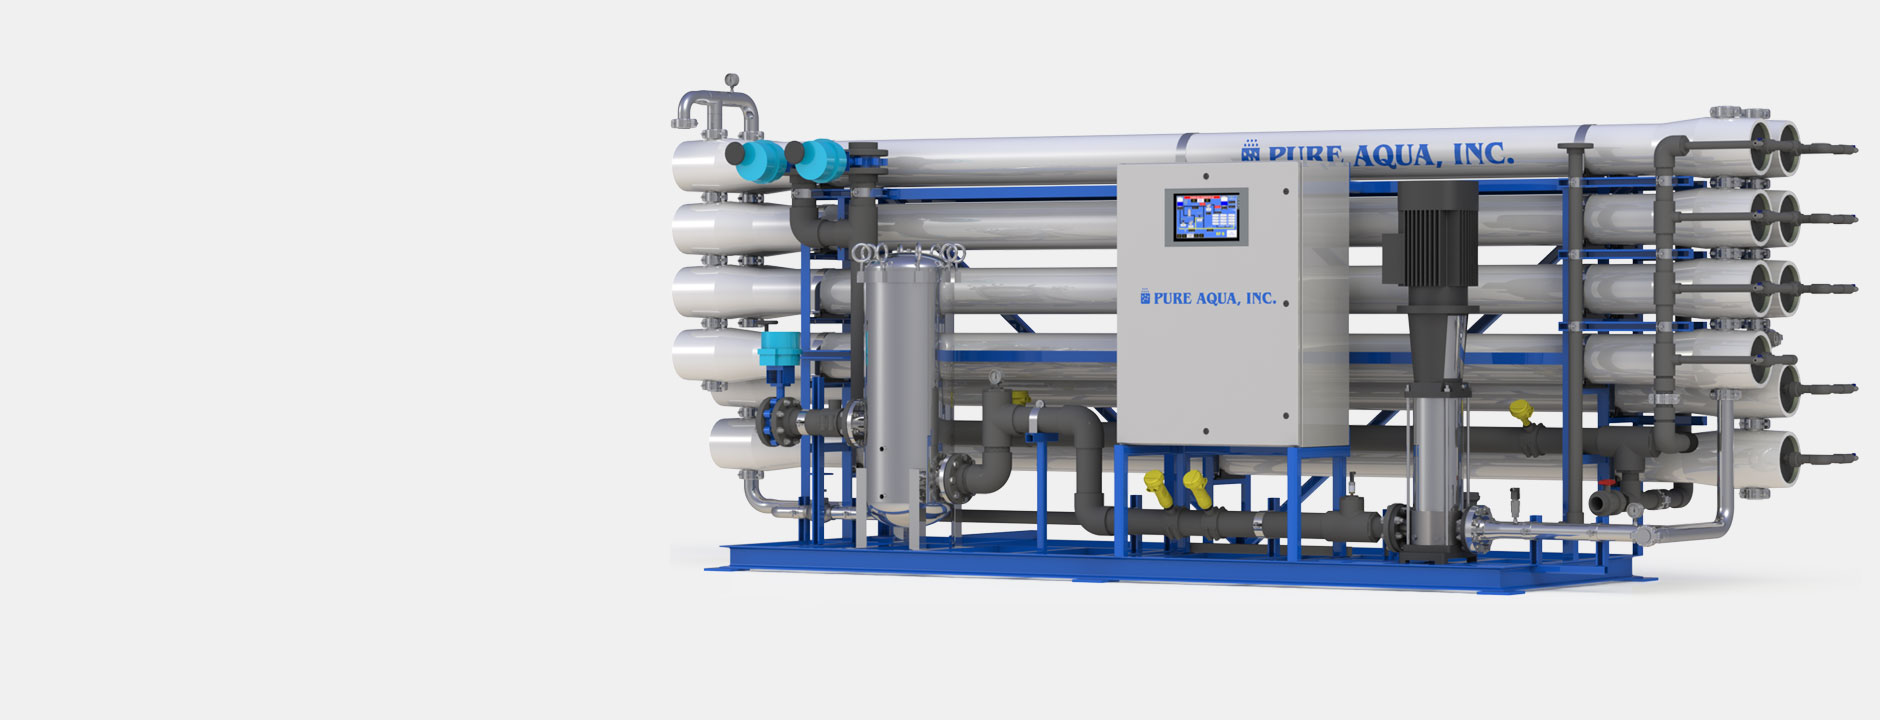 Systèmes industriels d'osmose inverse